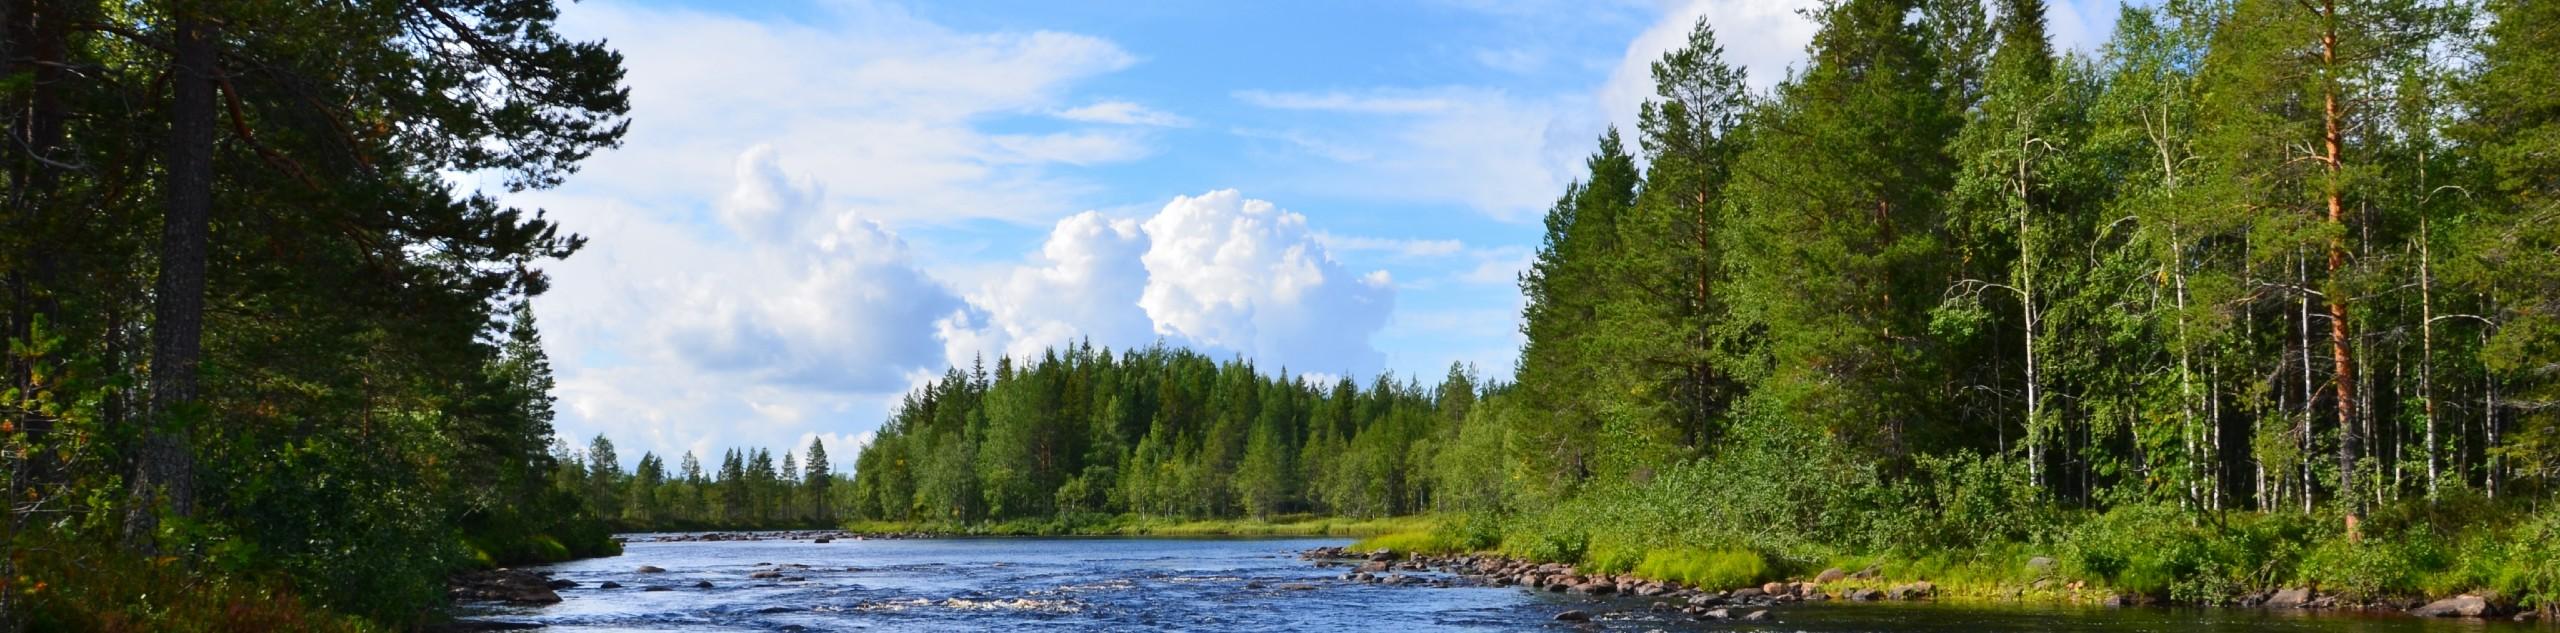 Karelia wilderness in Russia